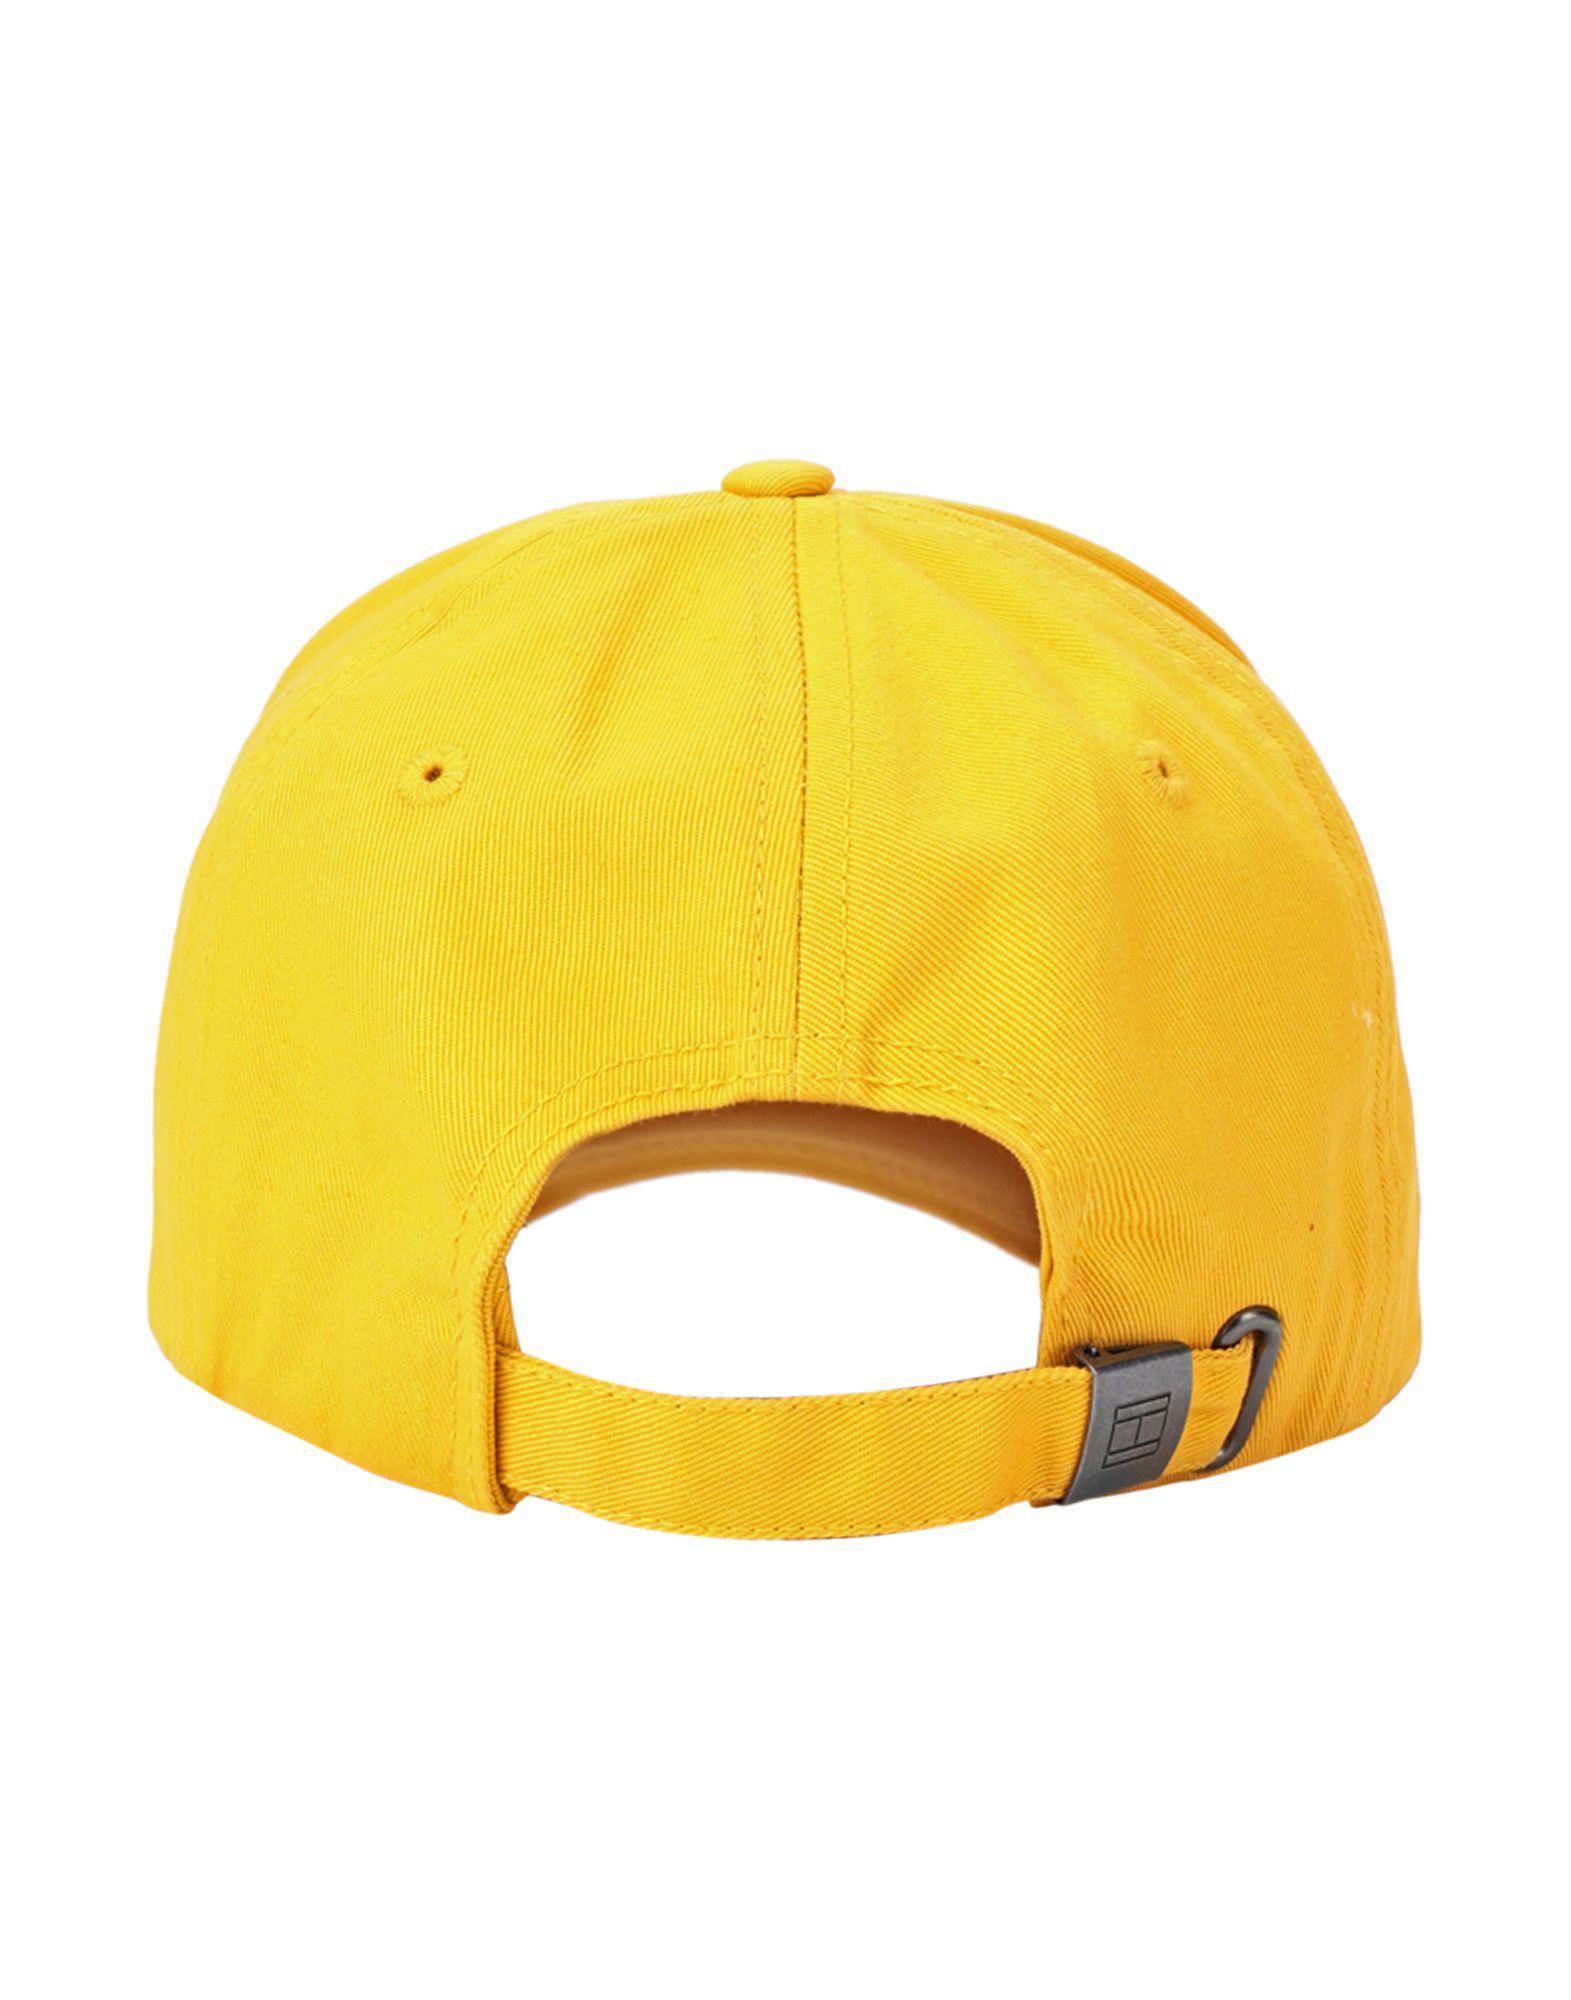 d9e58d66e98 Tommy Hilfiger Classic Baseball Cap in Yellow for Men - Lyst